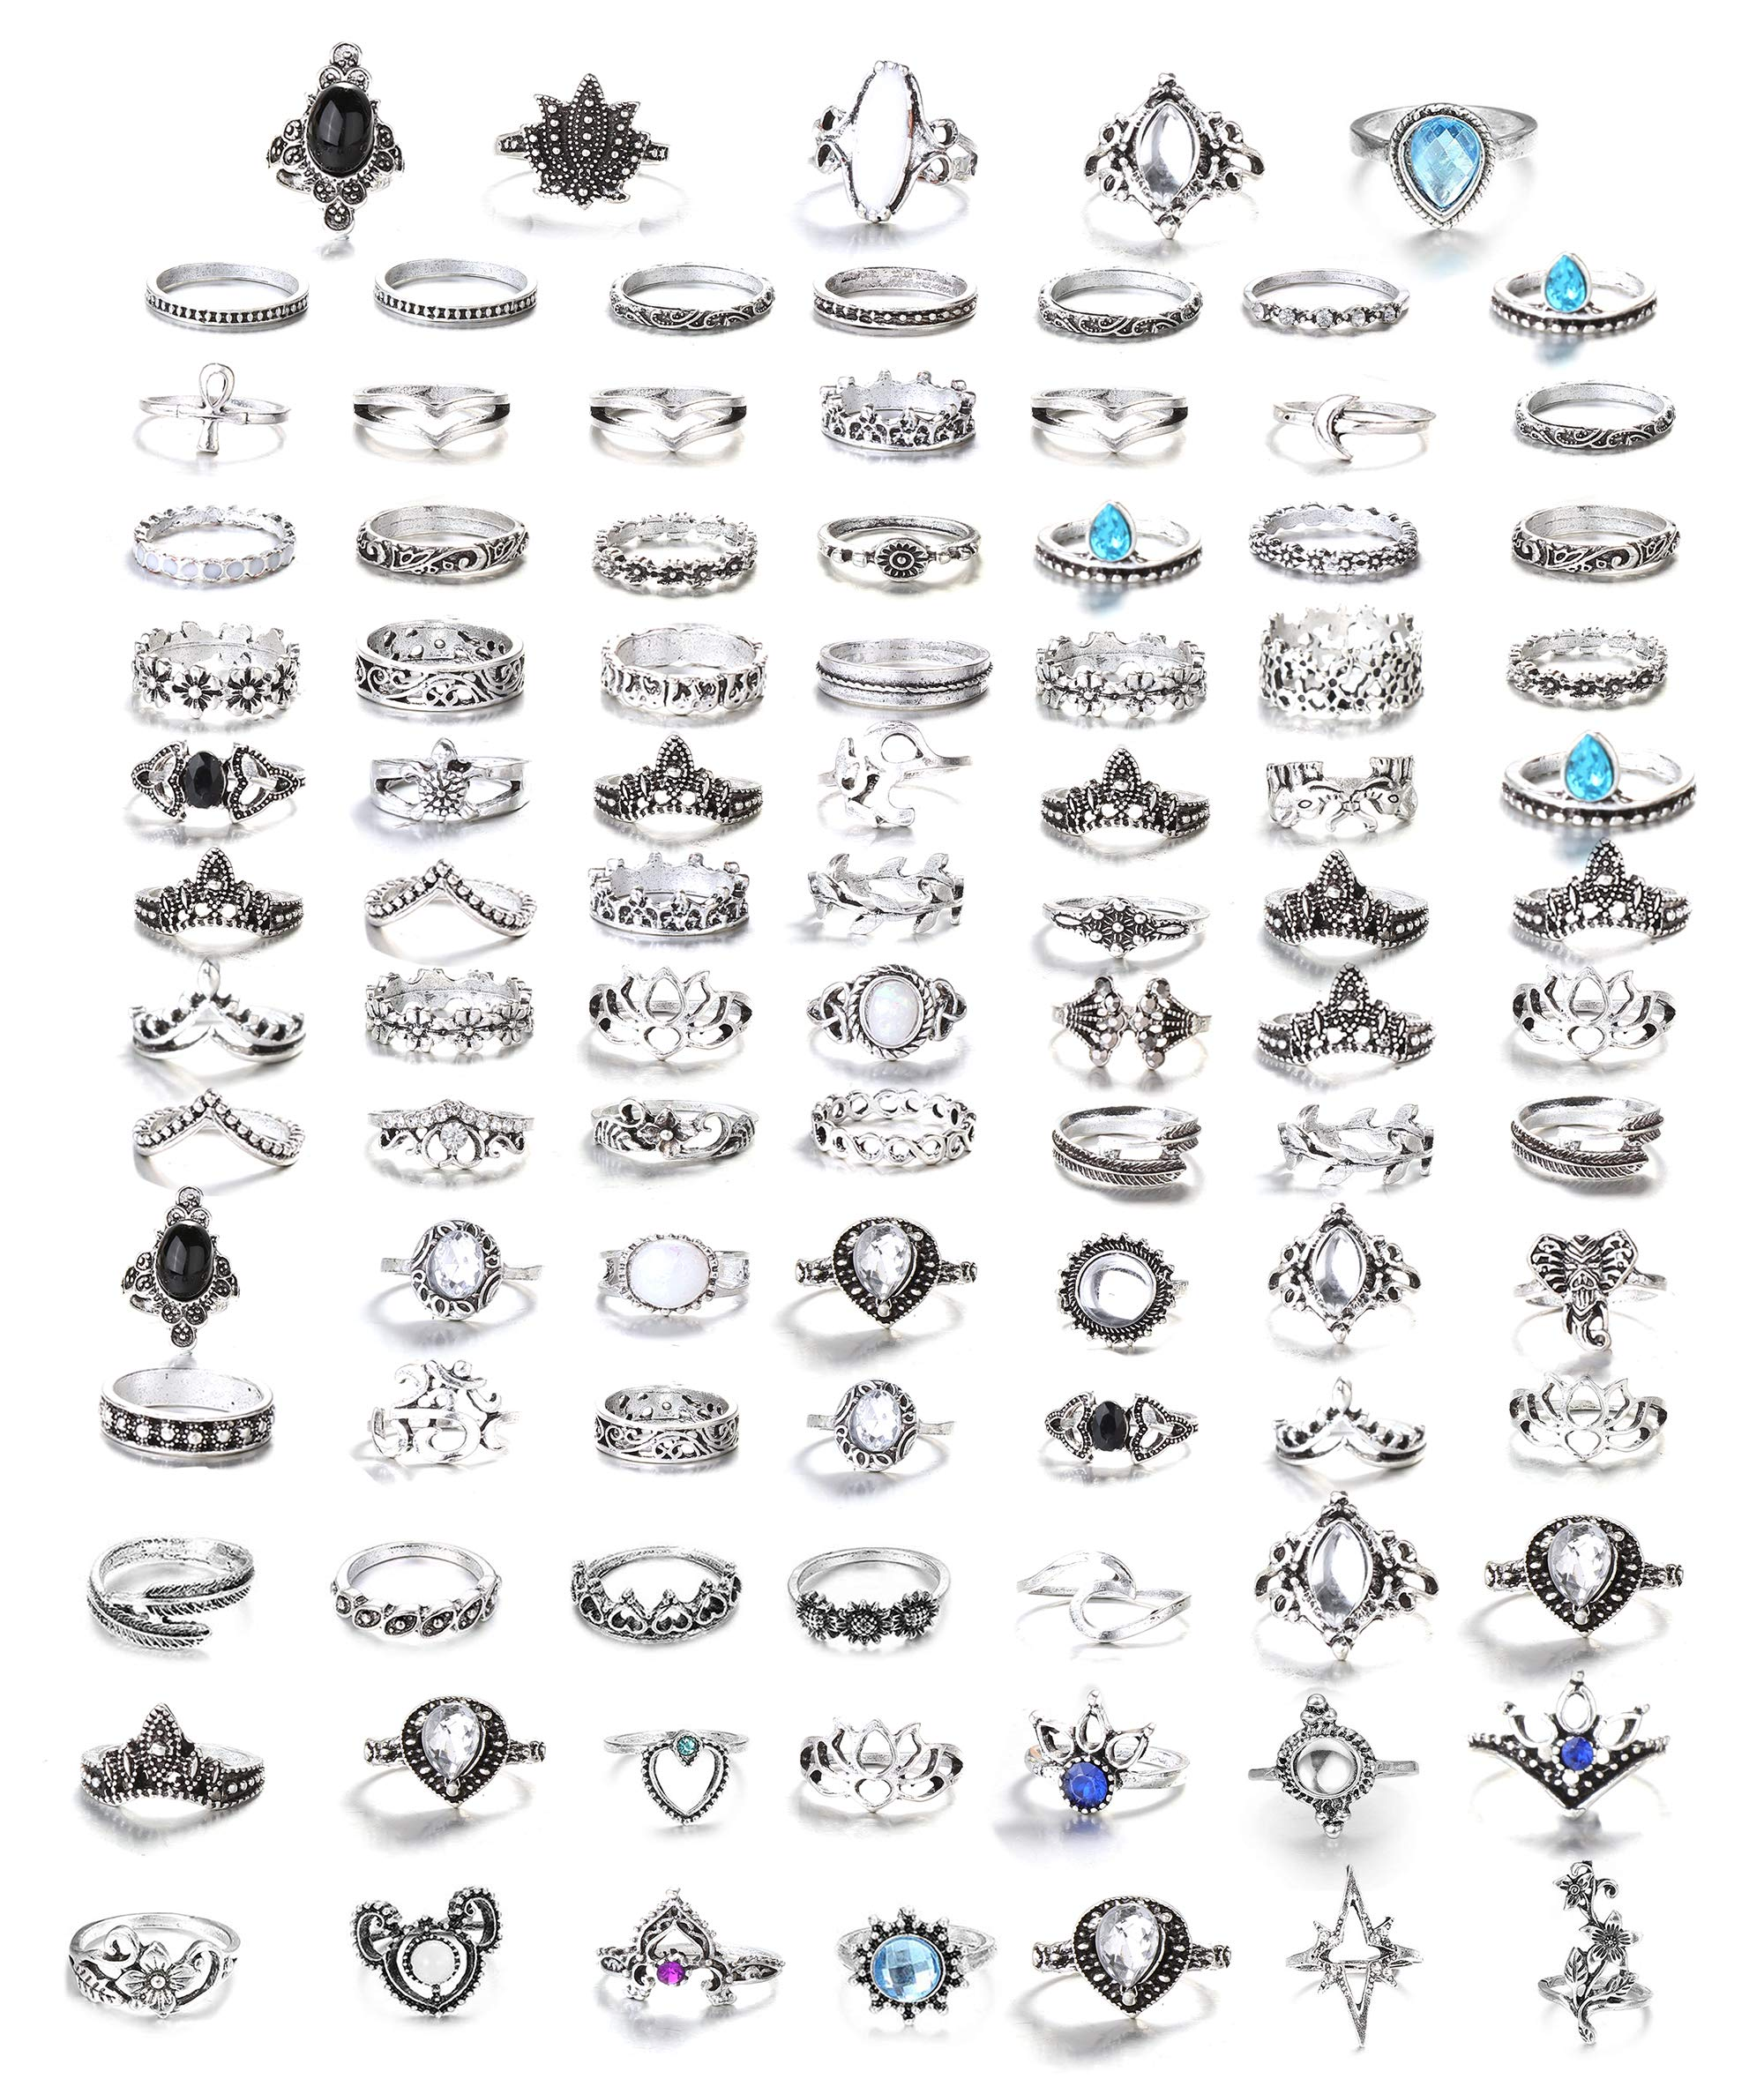 FIBO STEEL 101 Pcs Vintage Knuckle Rings for Women Girls Stackable Midi Finger Ring Set (B1: 101 Pcs a Set)